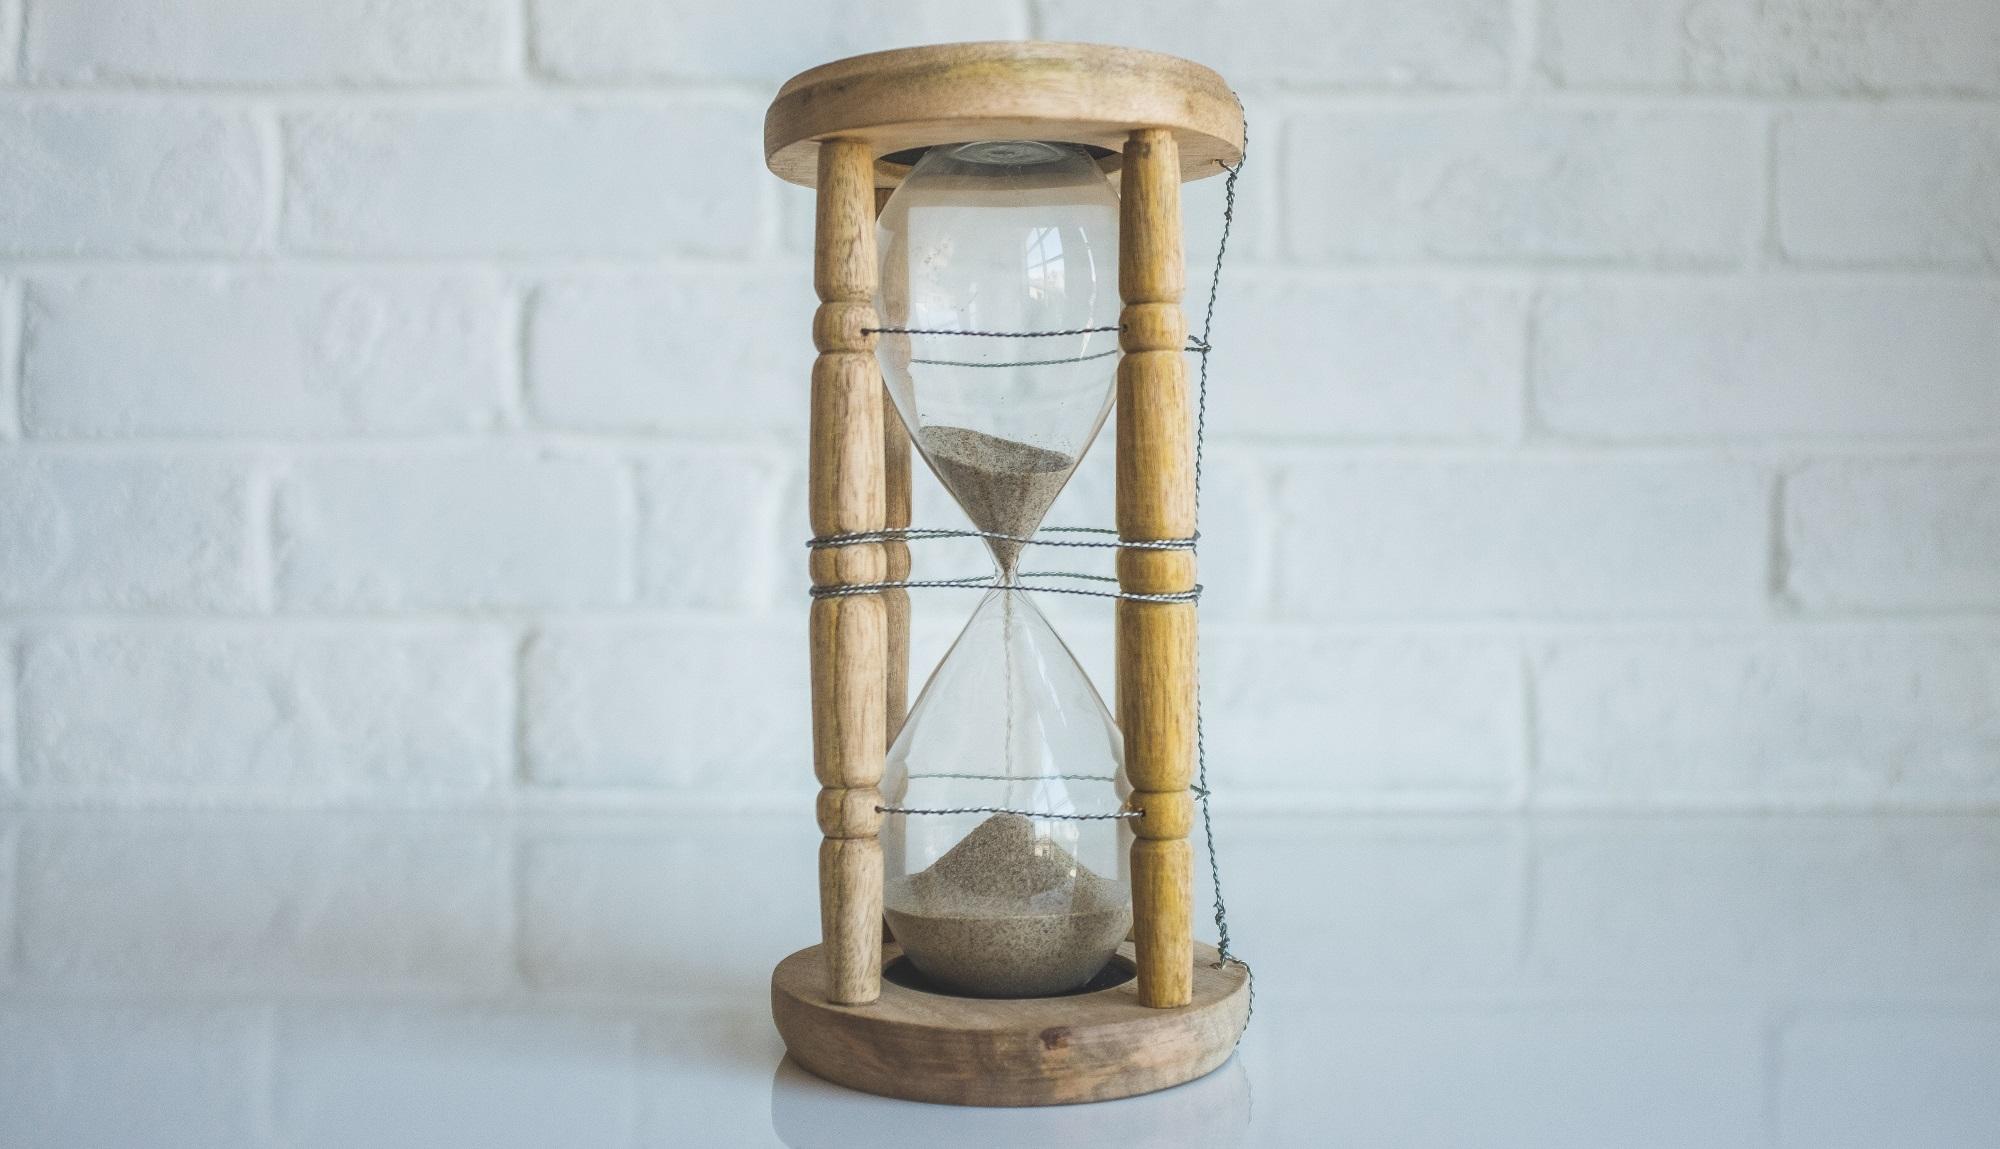 Time microservice